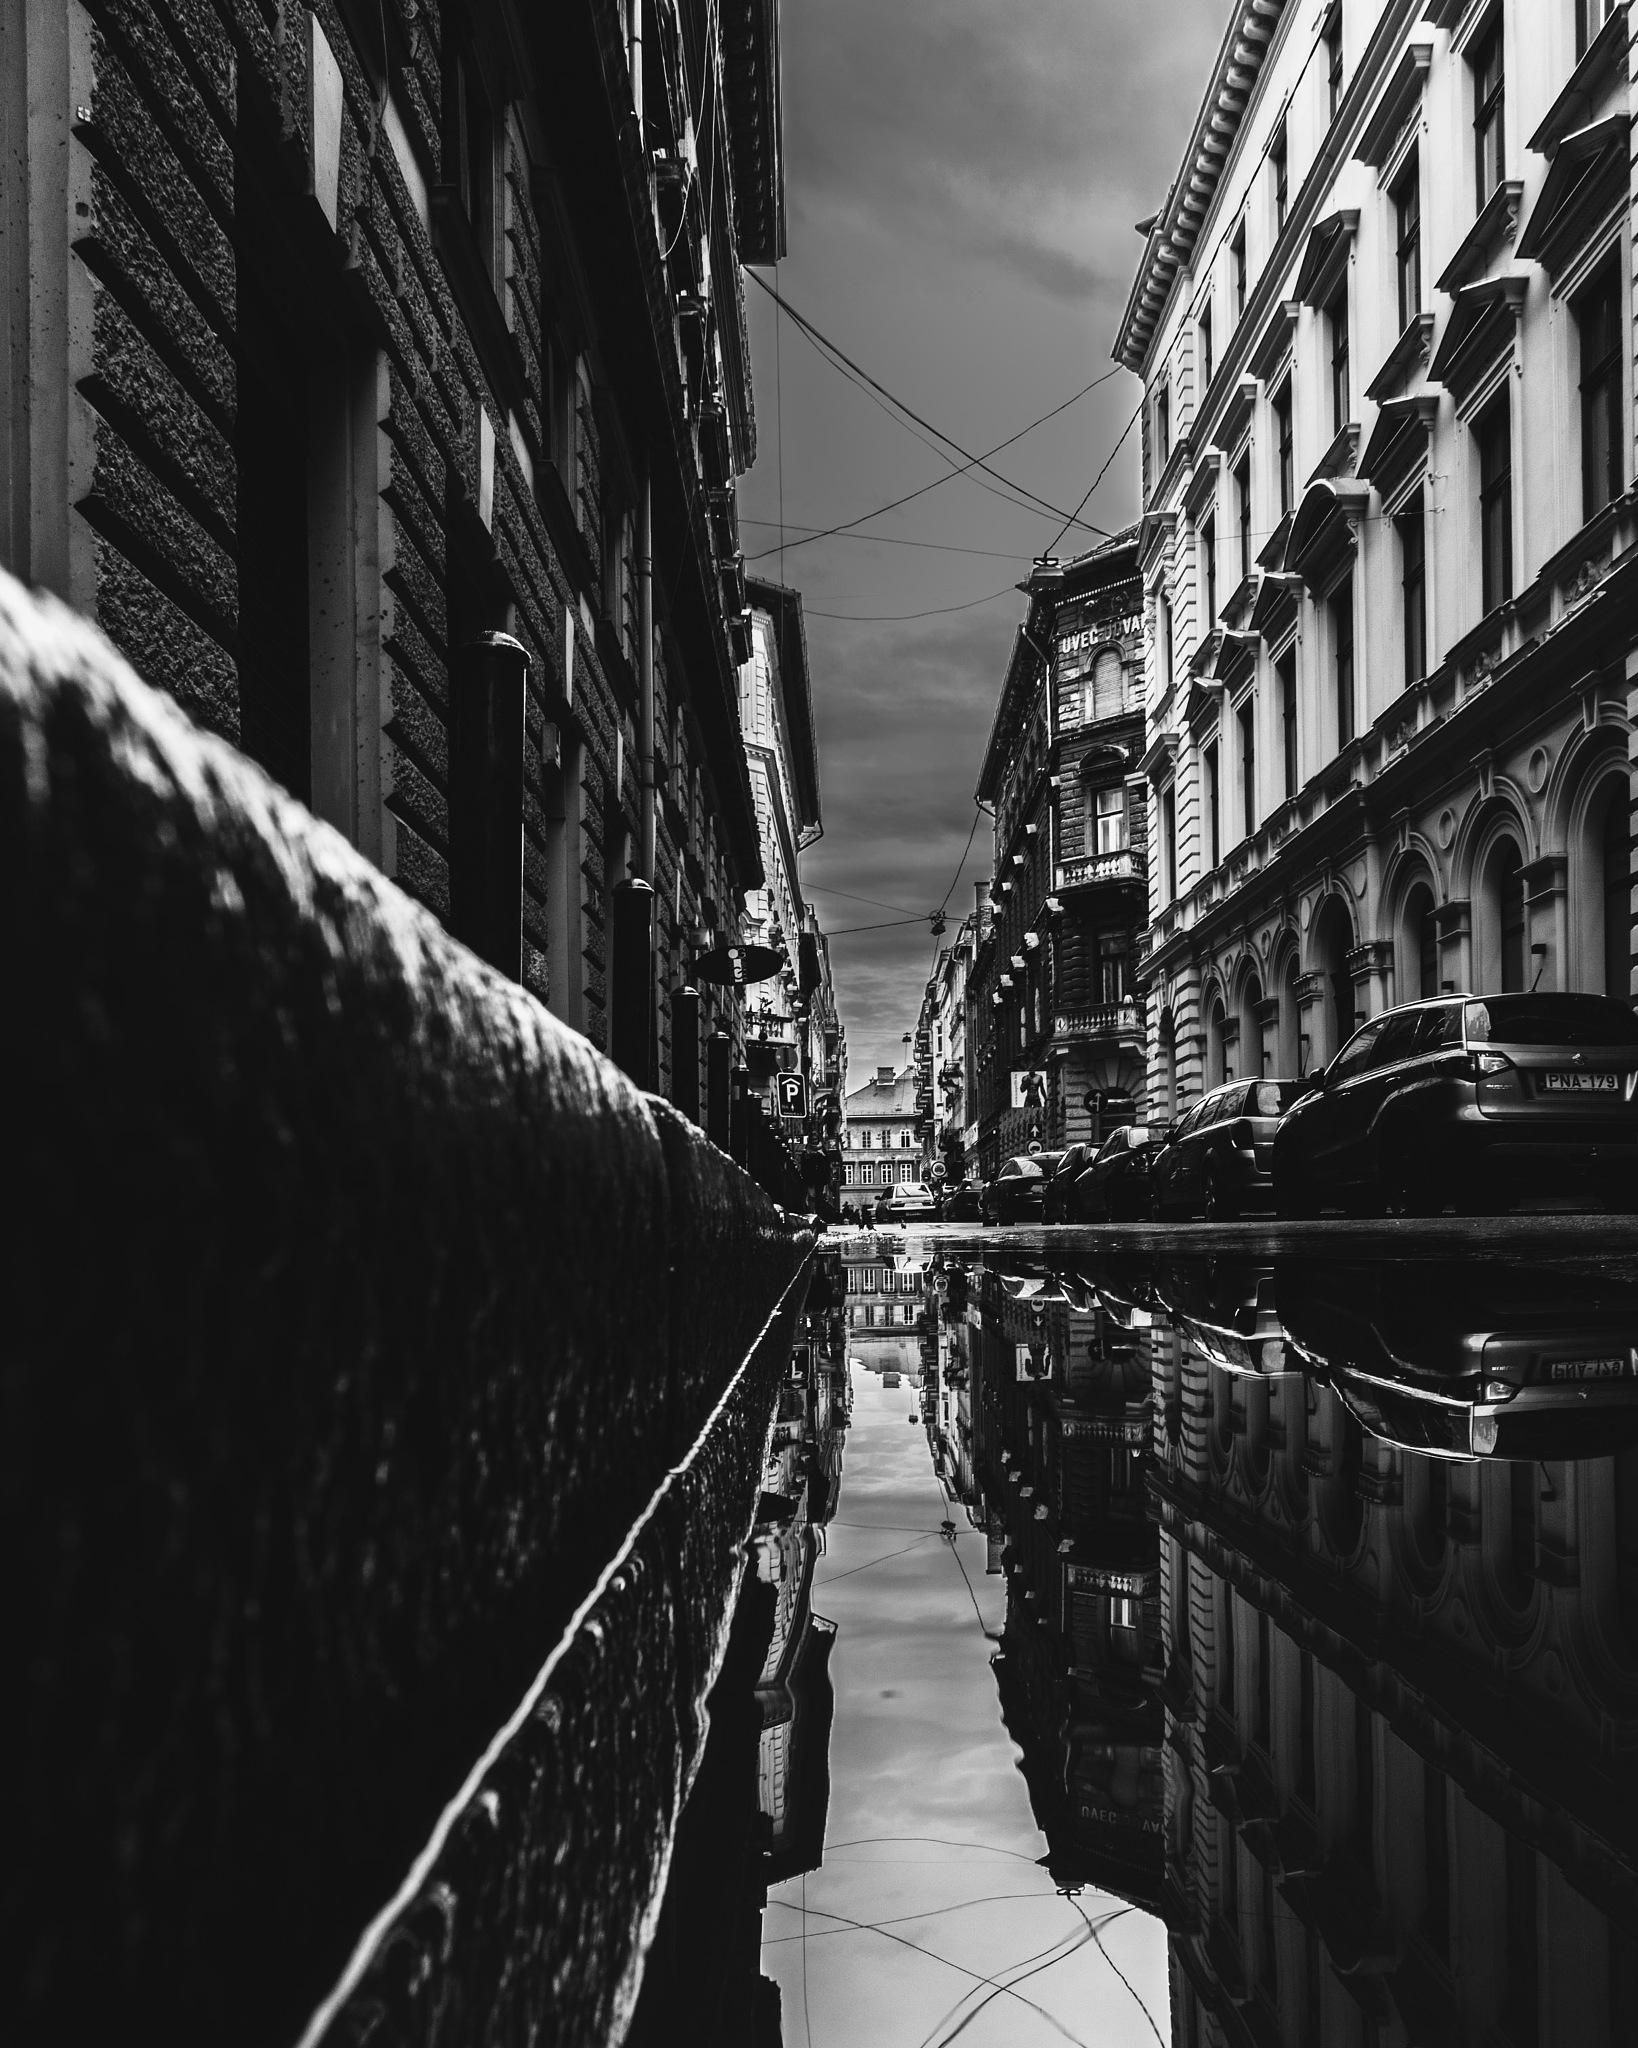 Untitled by Bencsik Laszlo